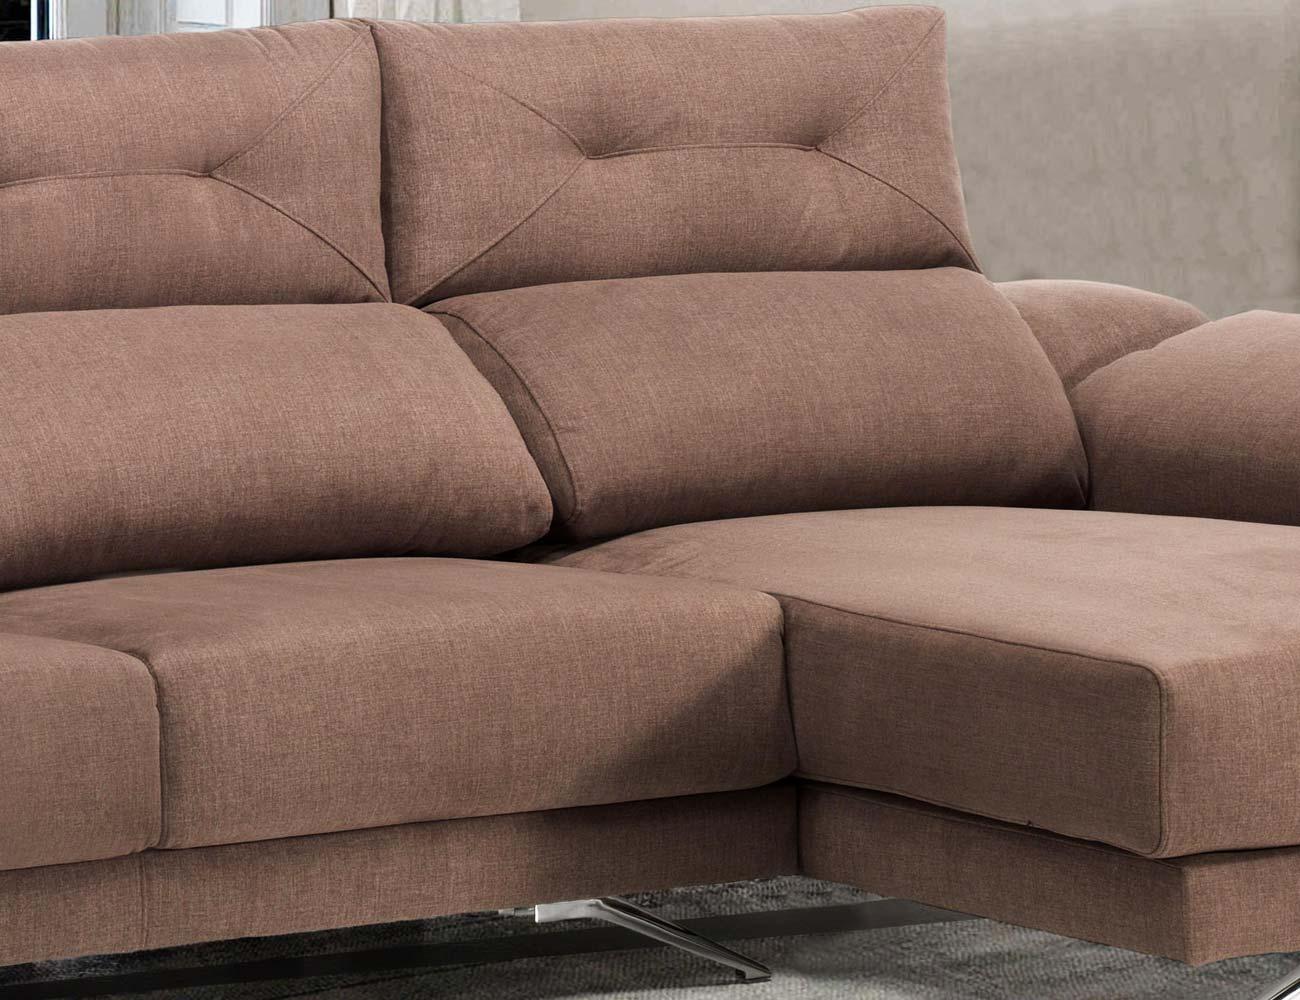 Sofa chaiselongue florencia detalle 1